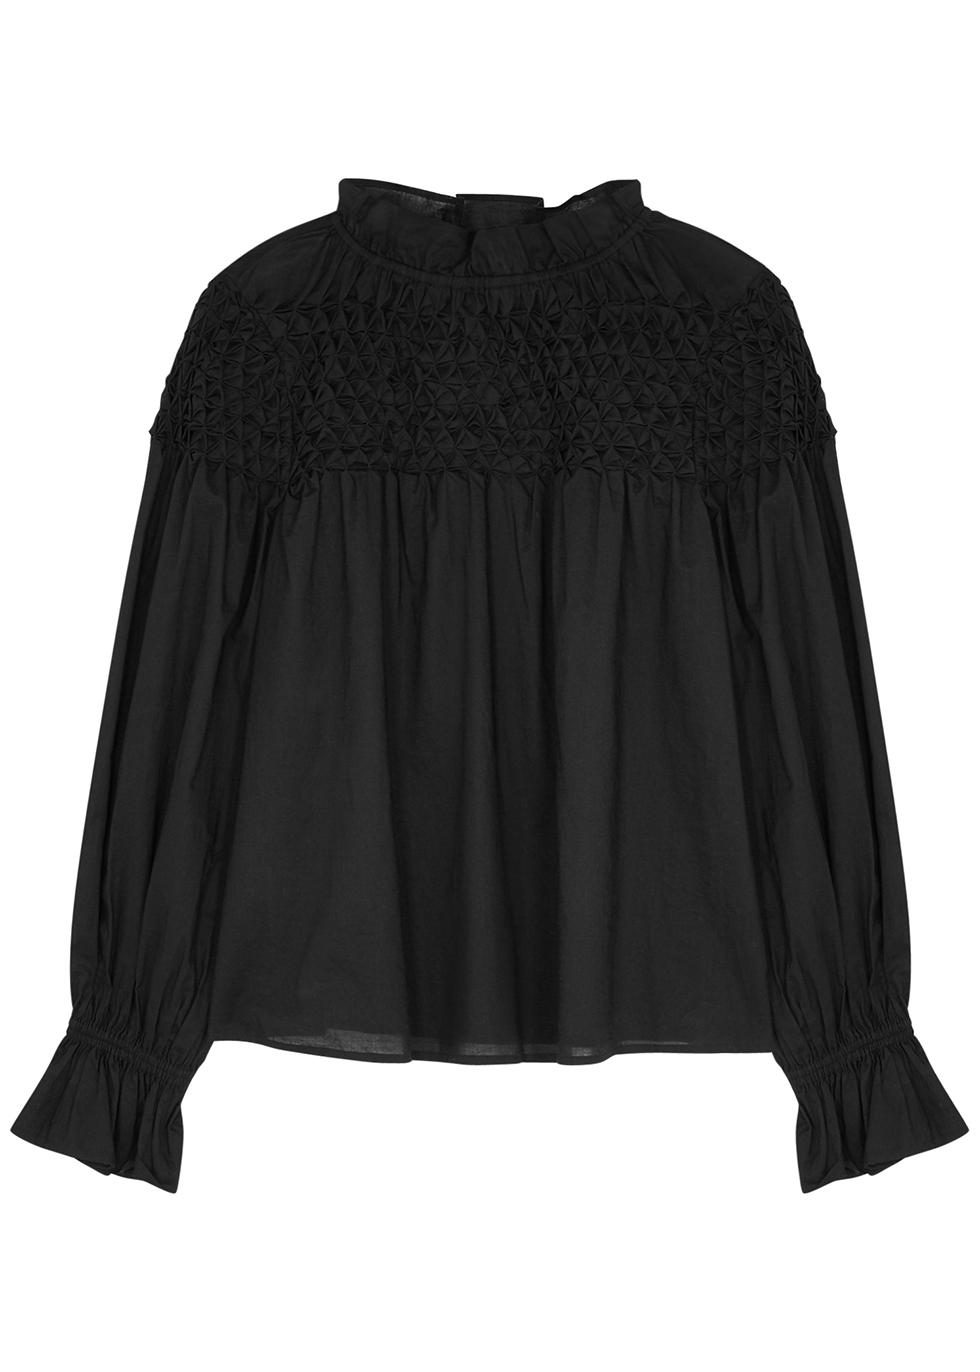 Majorelle black smocked cotton blouse